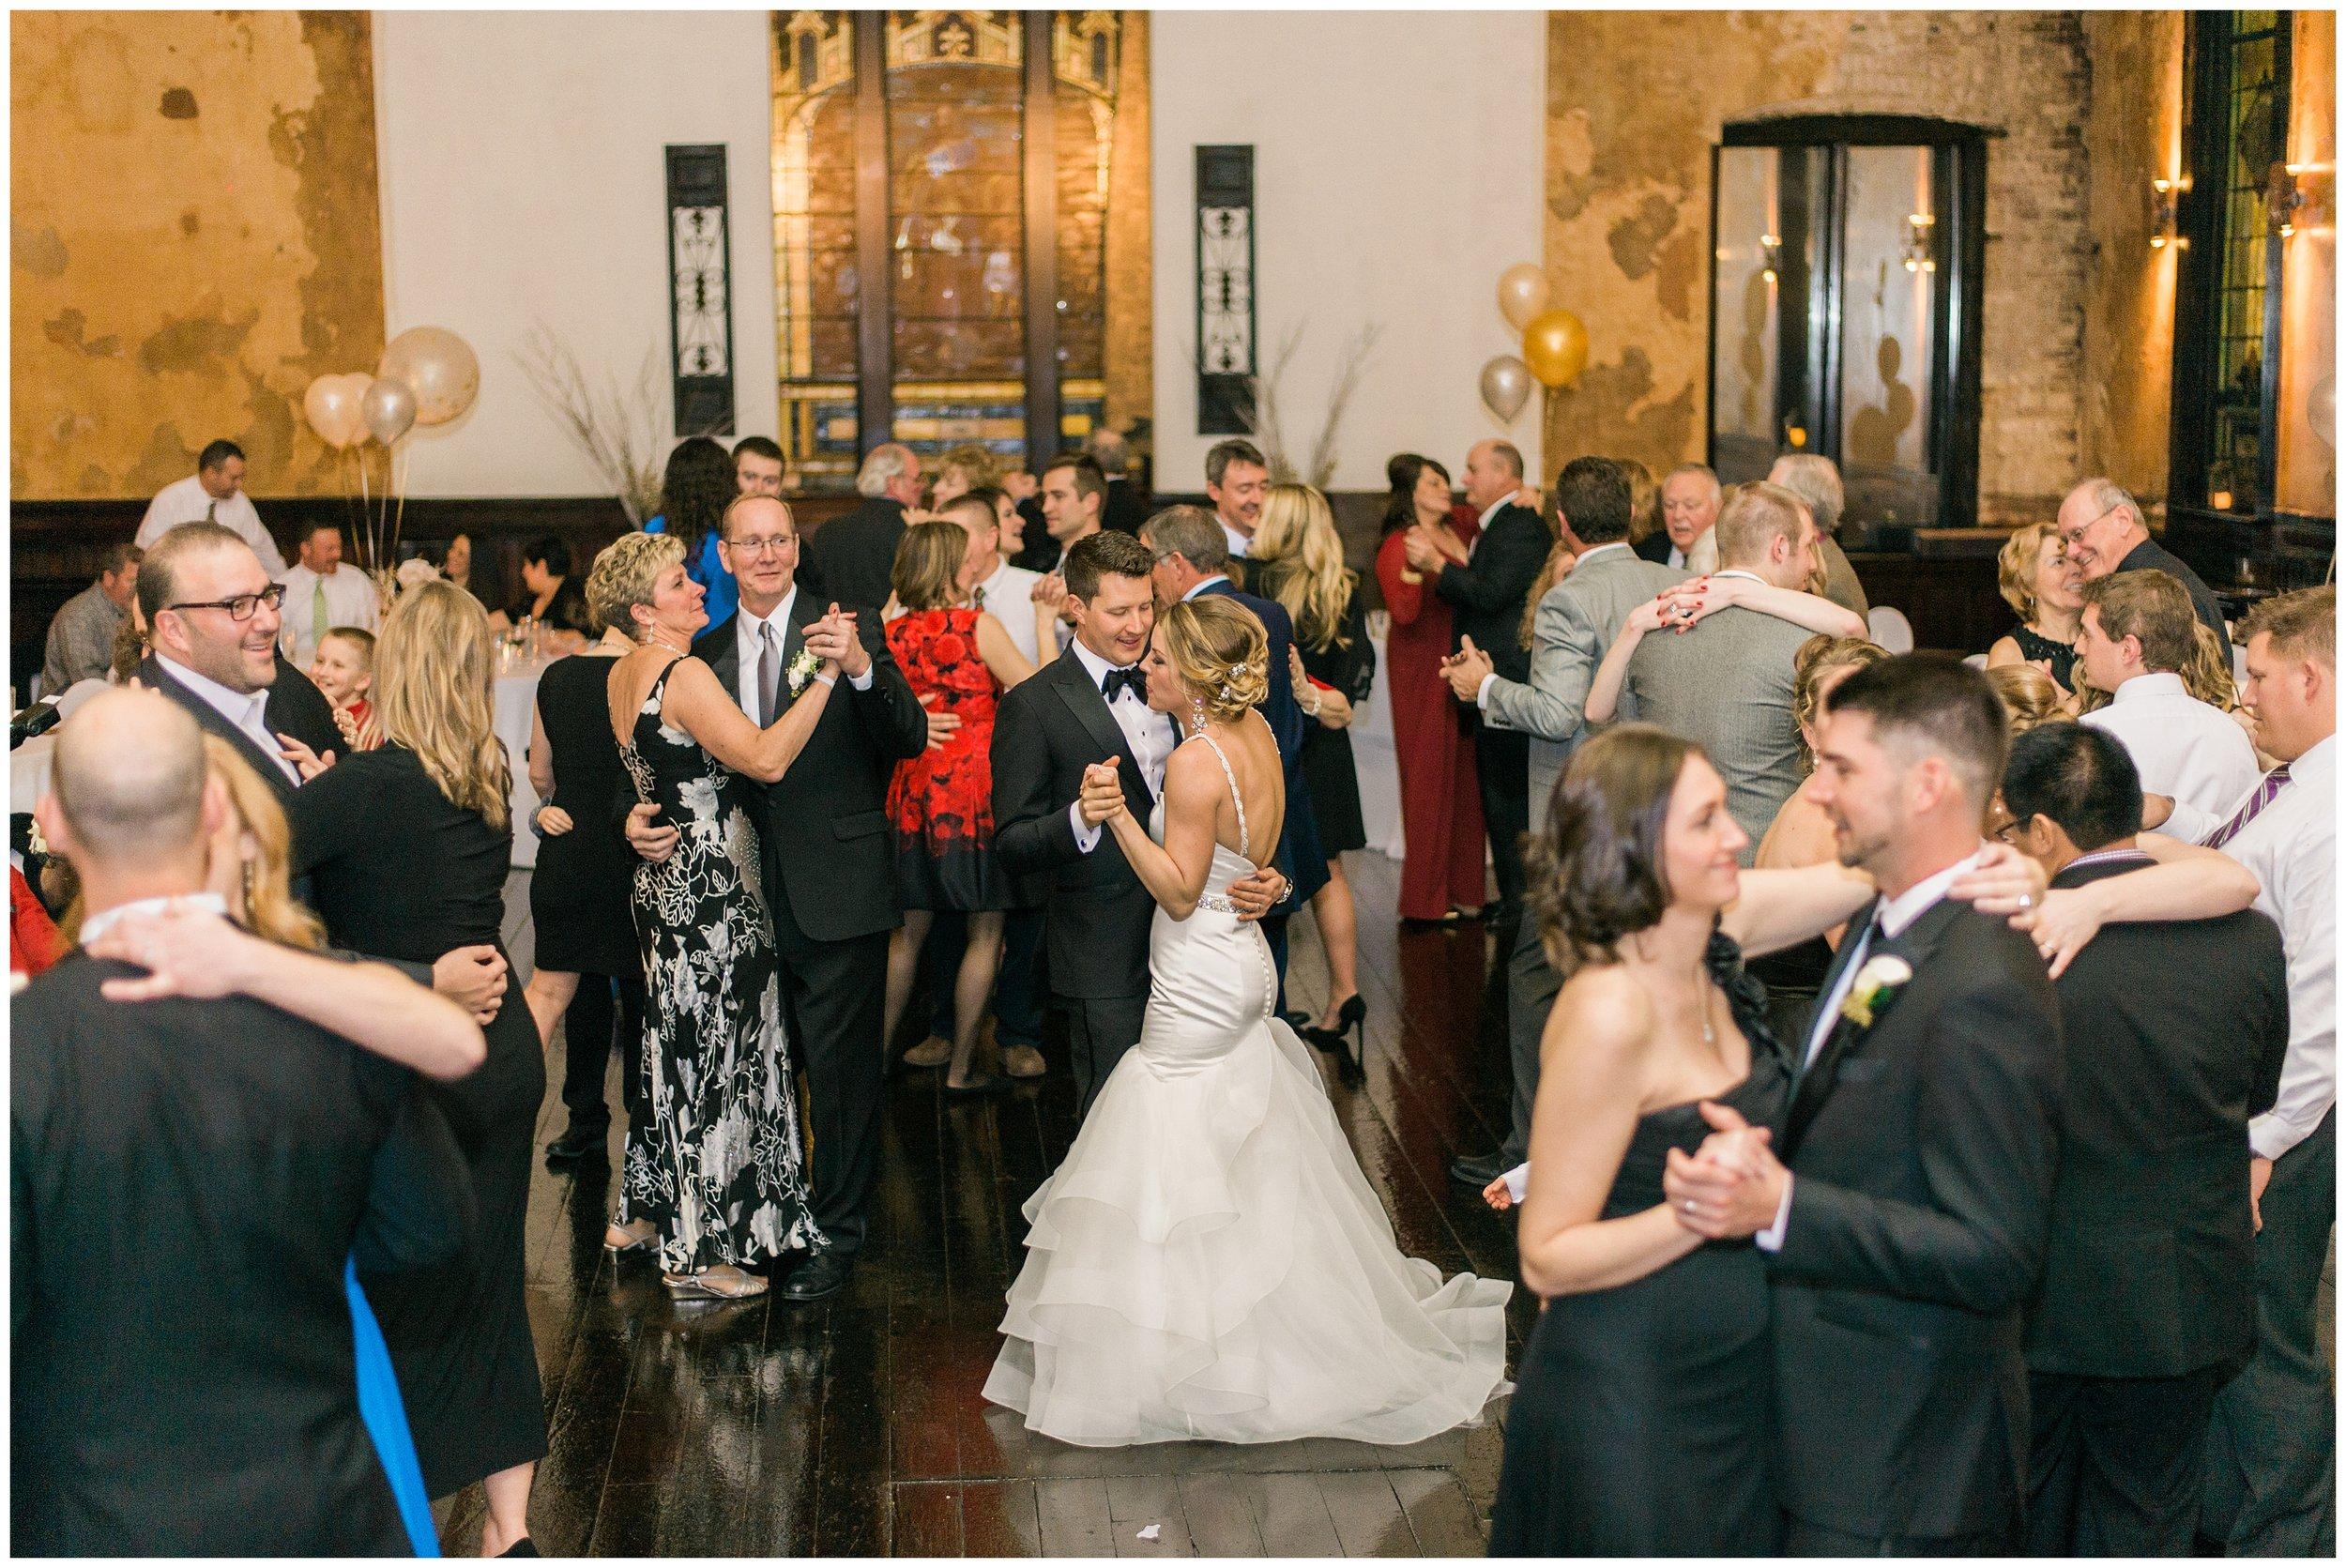 Rebecca_Bridges_Photography_Indianapolis_Wedding_Photographer_5861.jpg